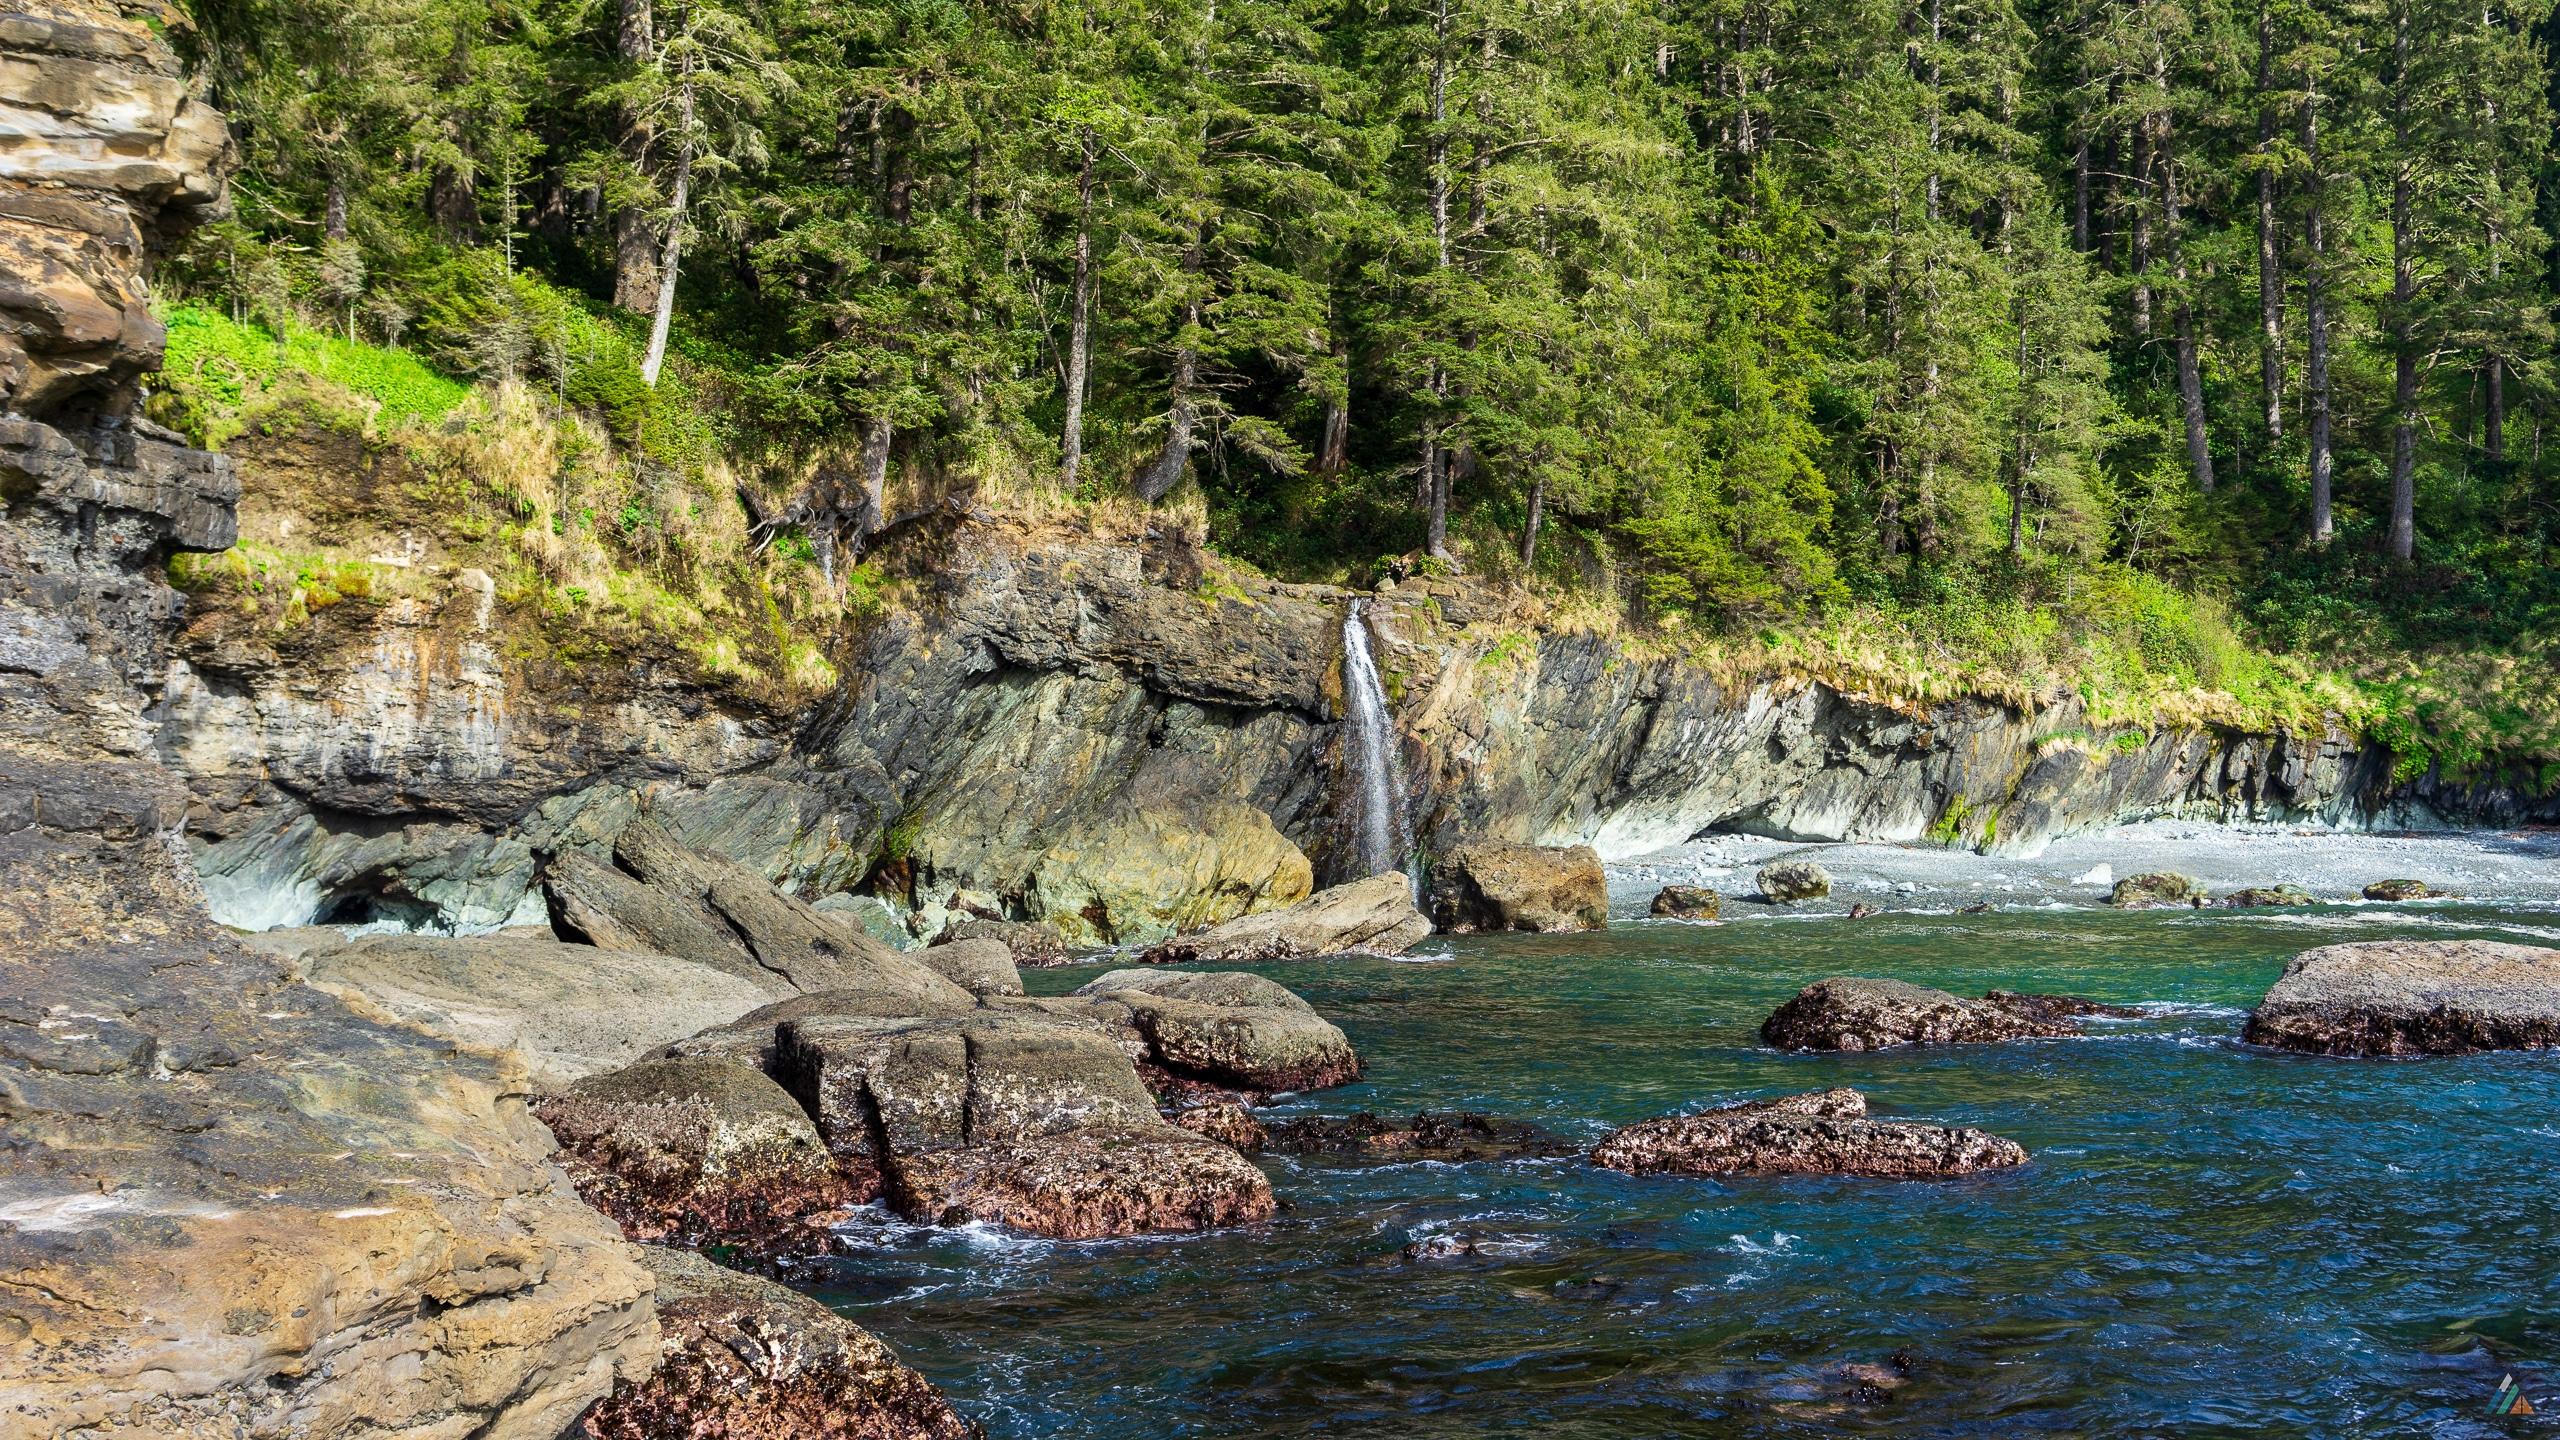 Natural Instagram Photos in Vancouver British Columbia